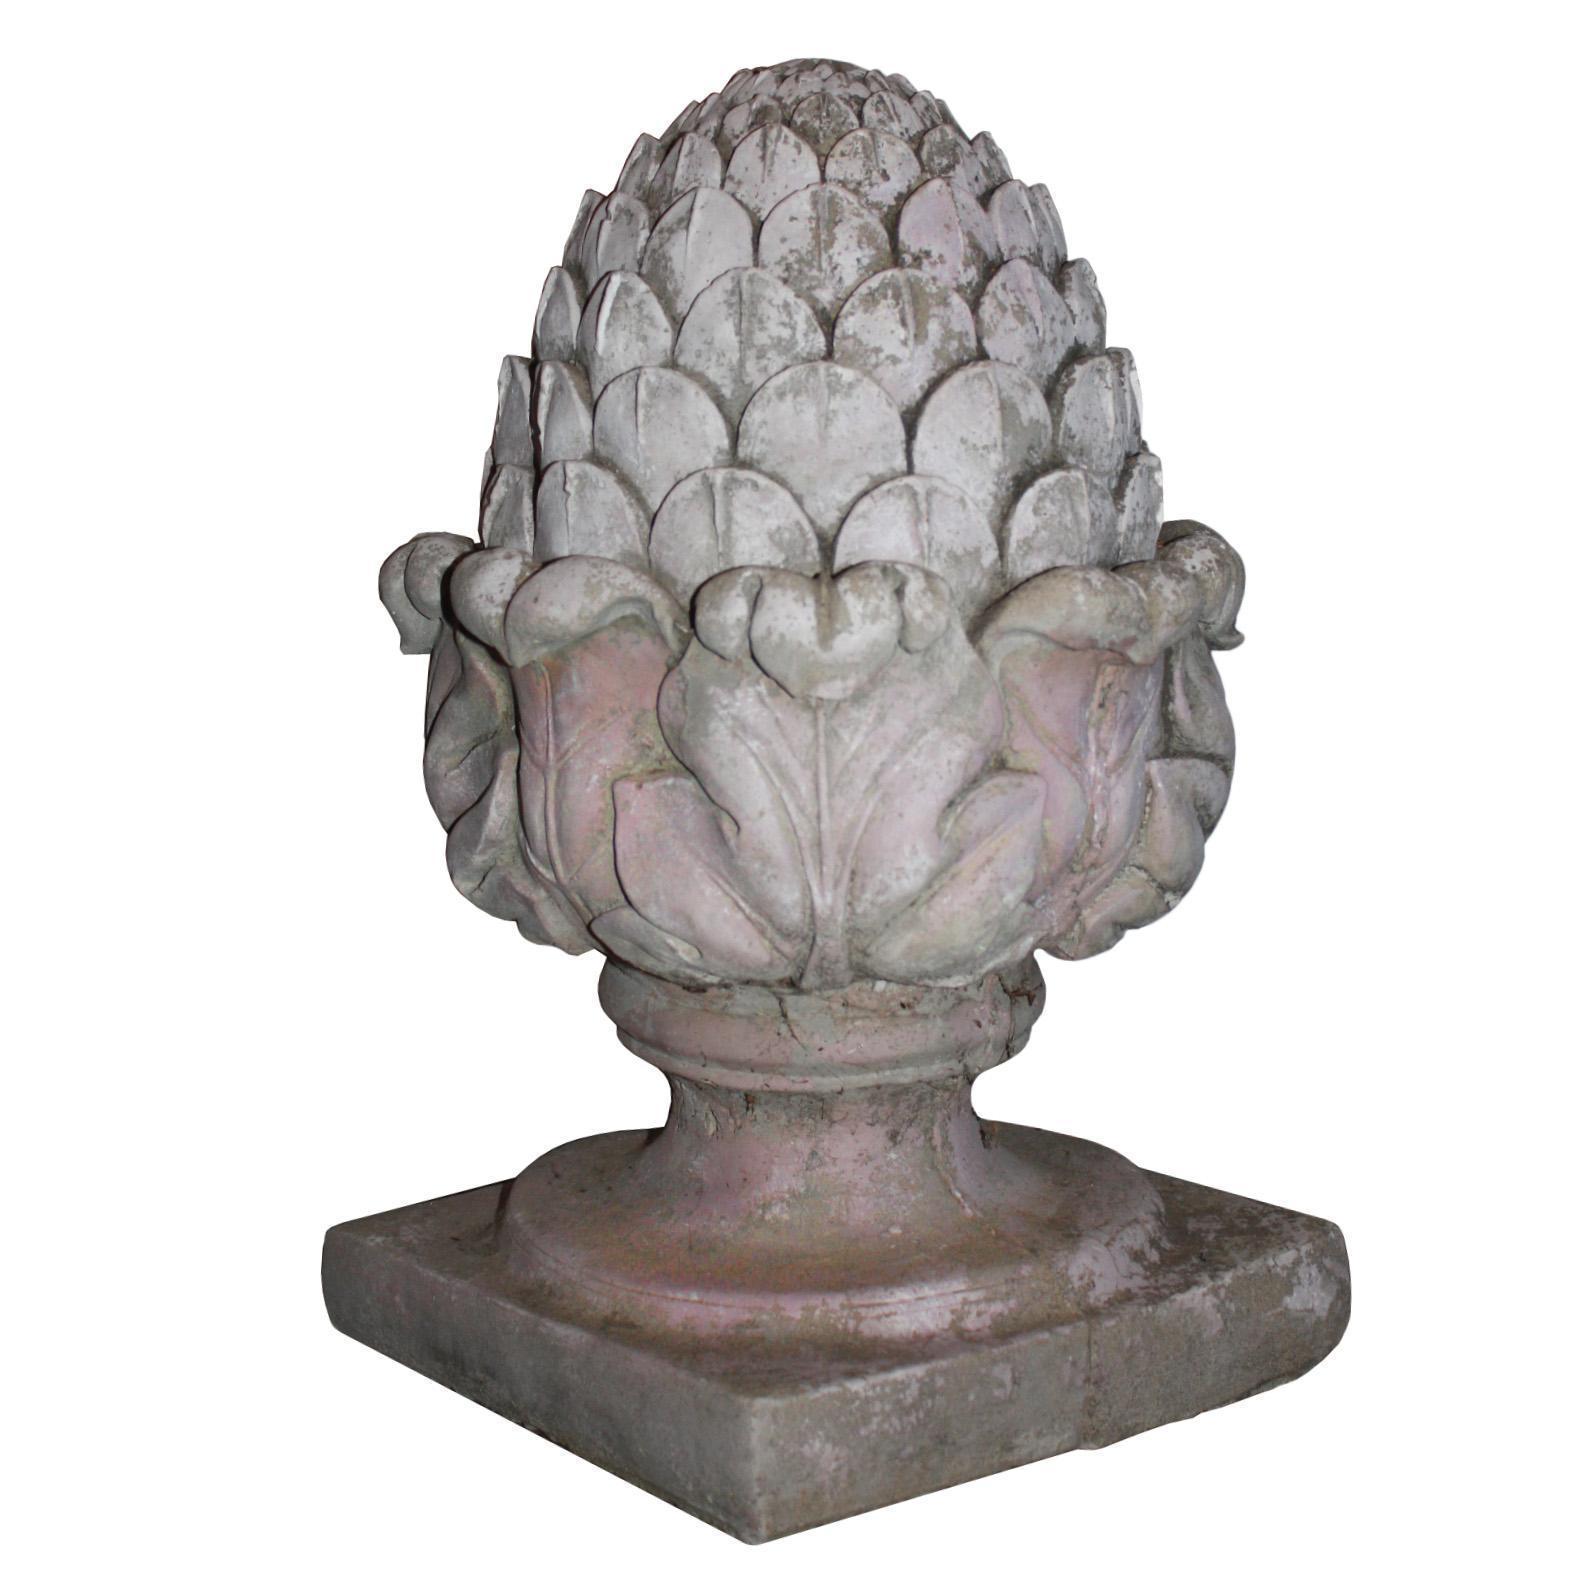 Antique Cast Stone Artichoke, Early 1900s